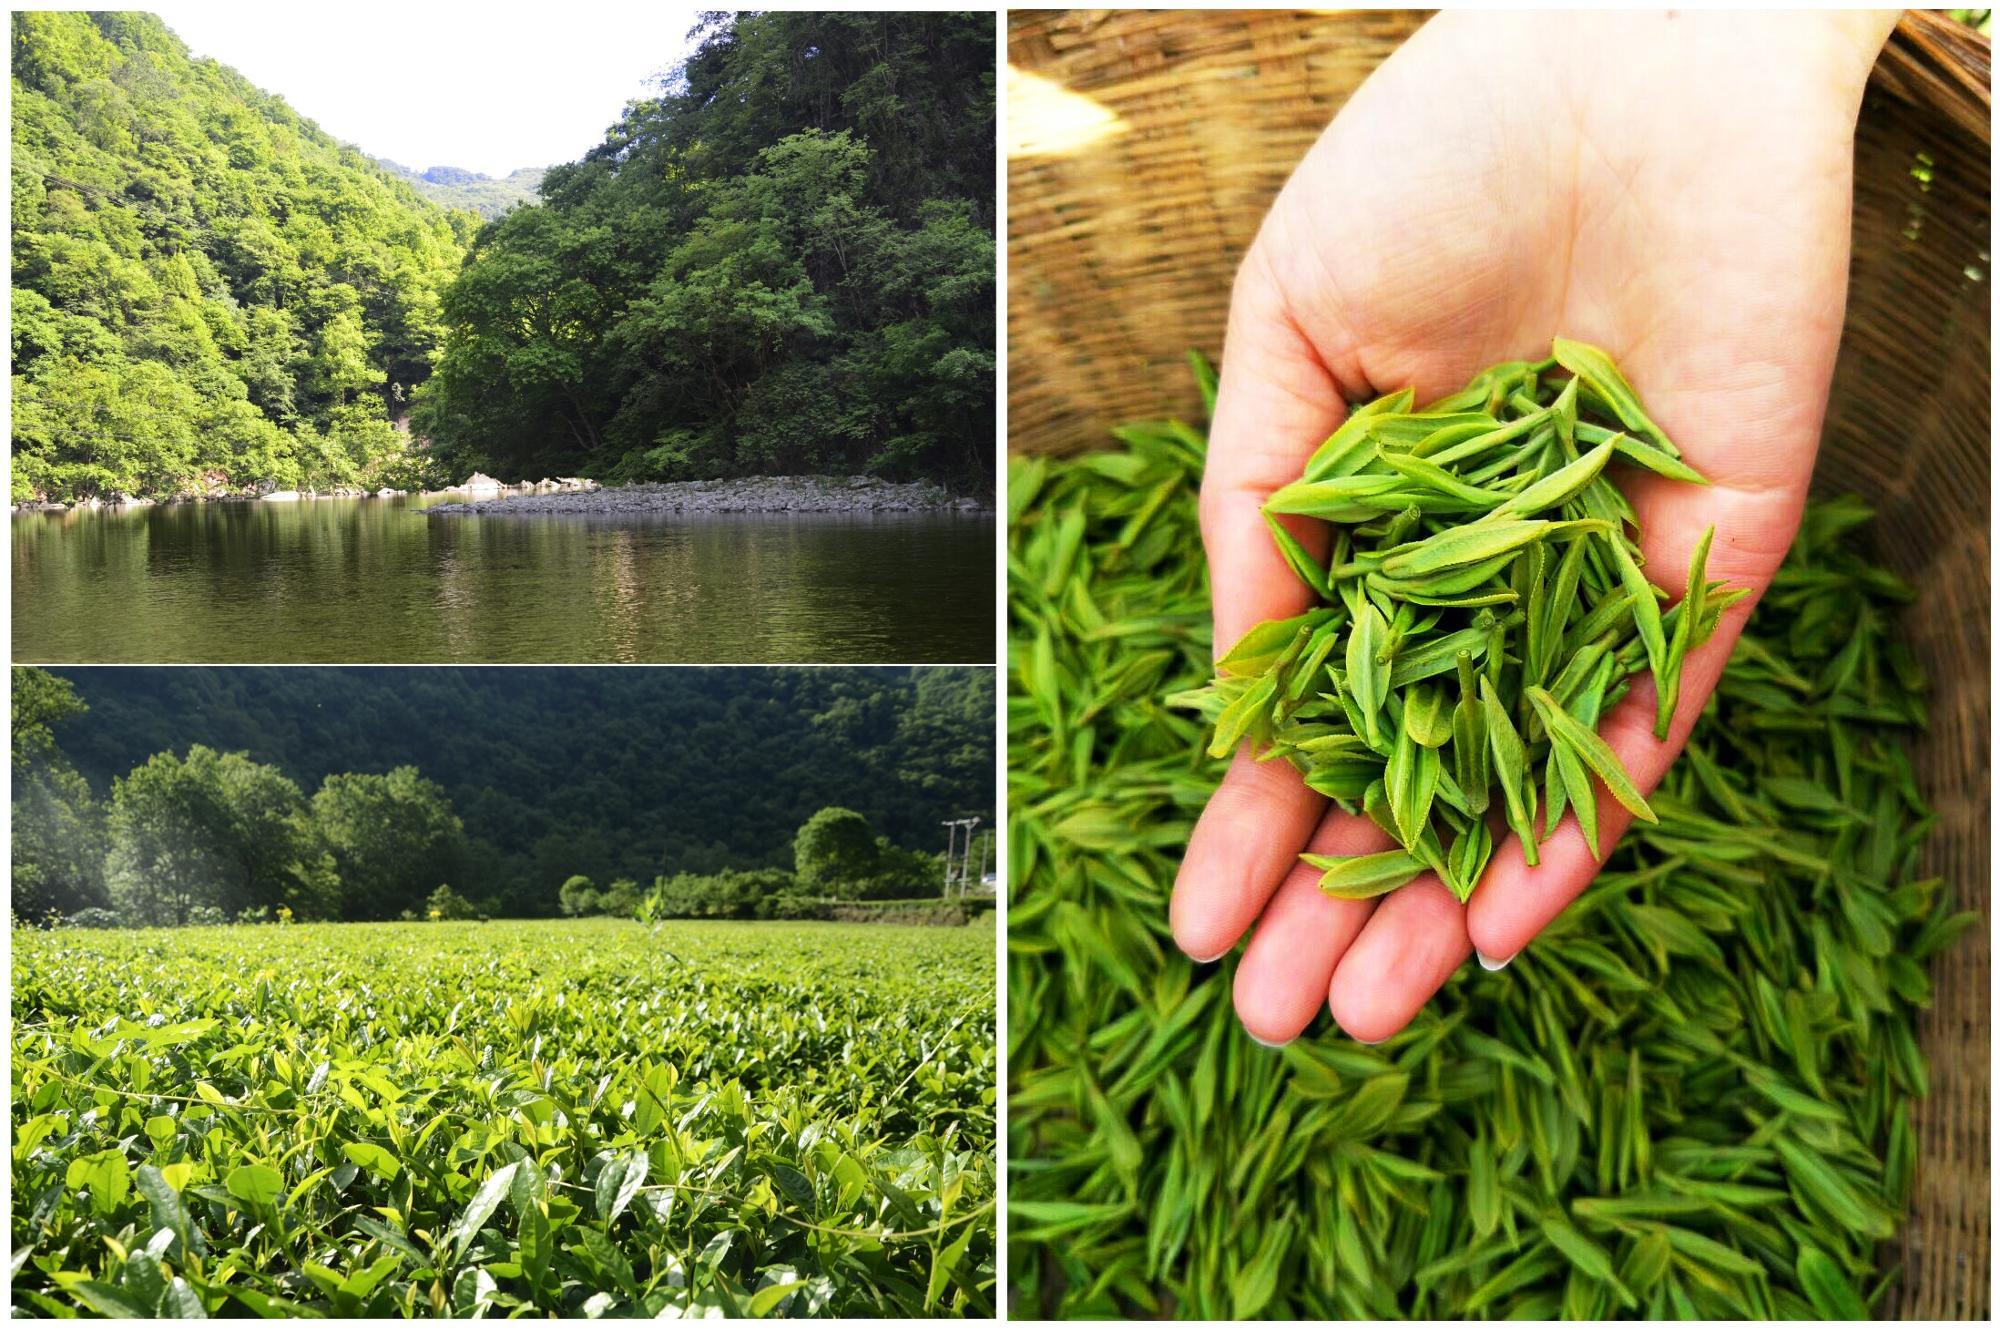 AAAA black our company want distributor home & garden herbal kids trolley tea detox herbal chinese gift energy black tea - 4uTea | 4uTea.com